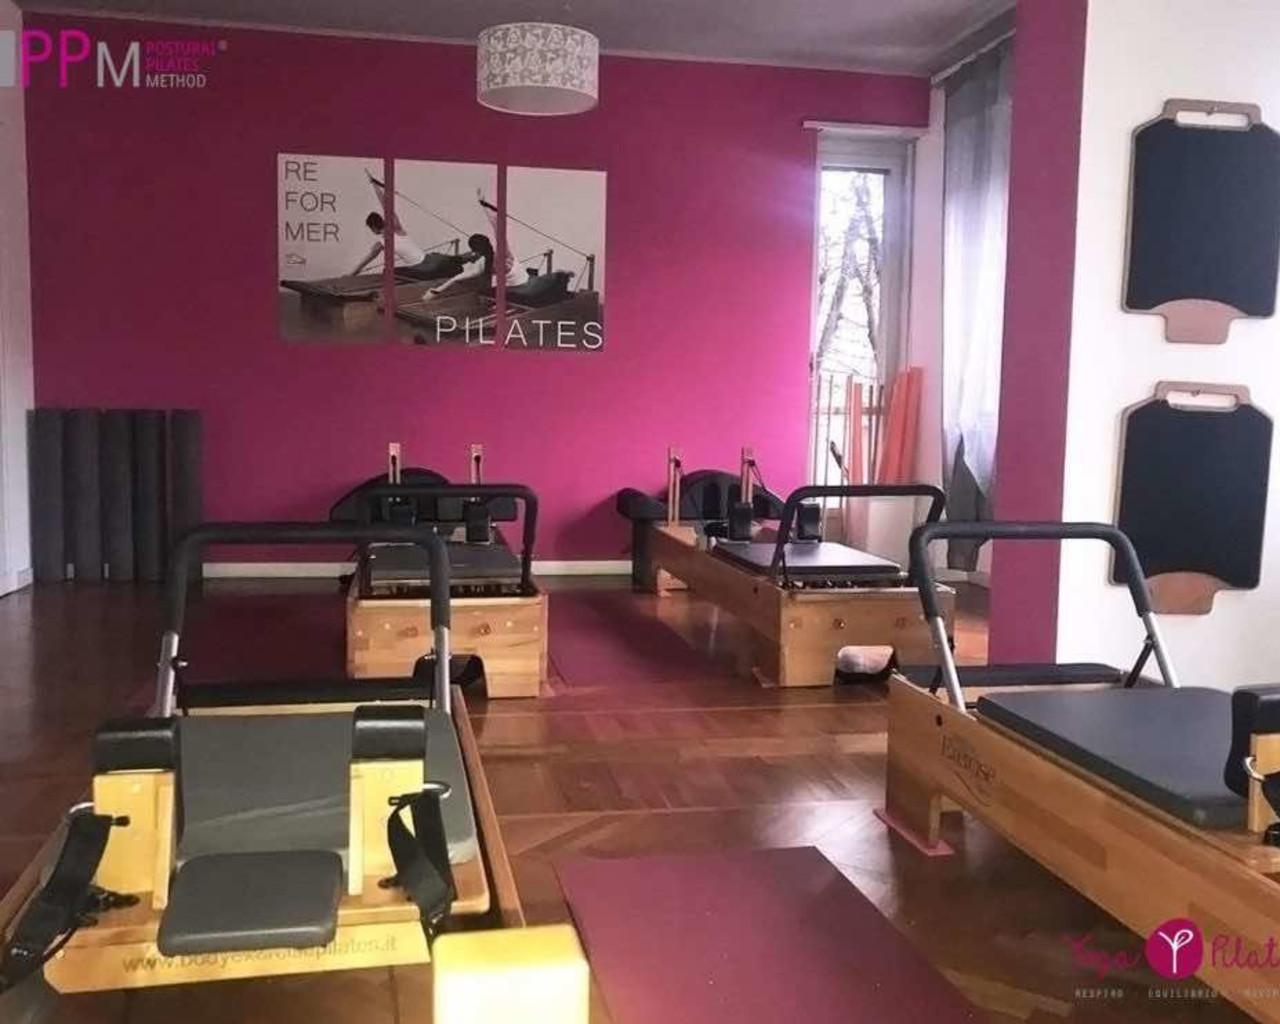 Yoga Pilates PPM Orbassano